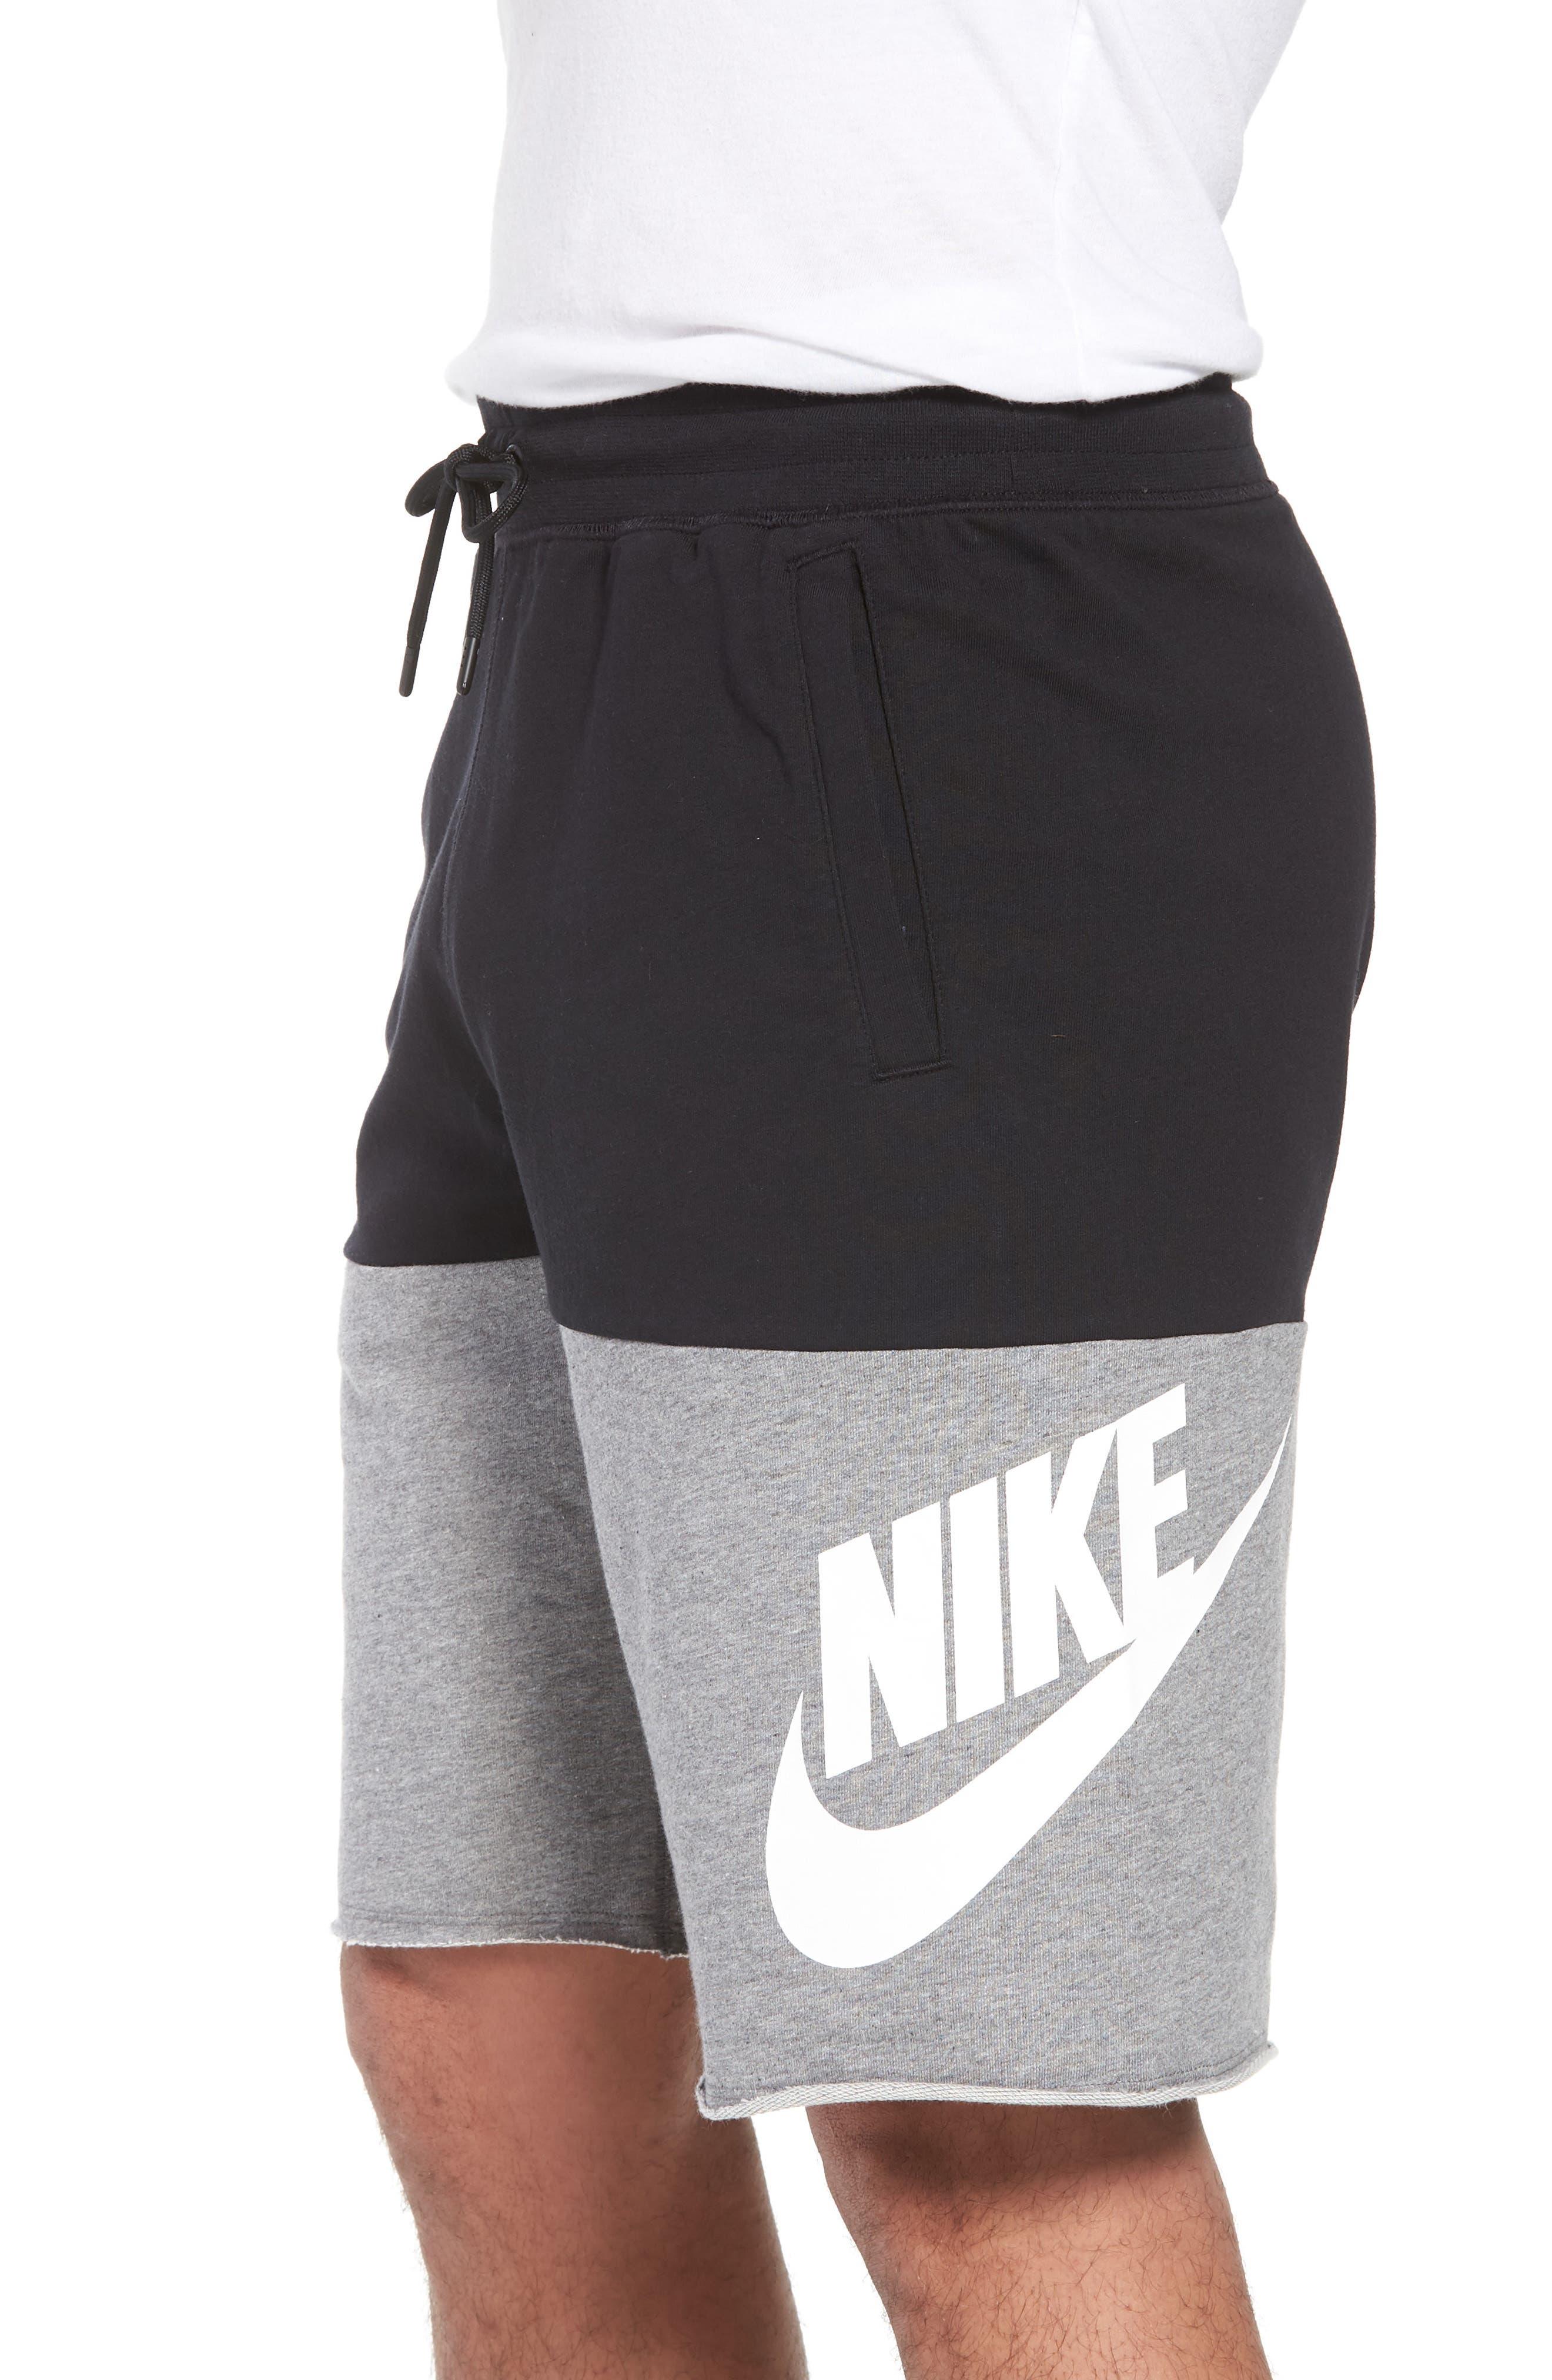 NSW Franchise GX3 Shorts,                             Alternate thumbnail 3, color,                             BLACK/ CARBON HEATHER/ WHITE